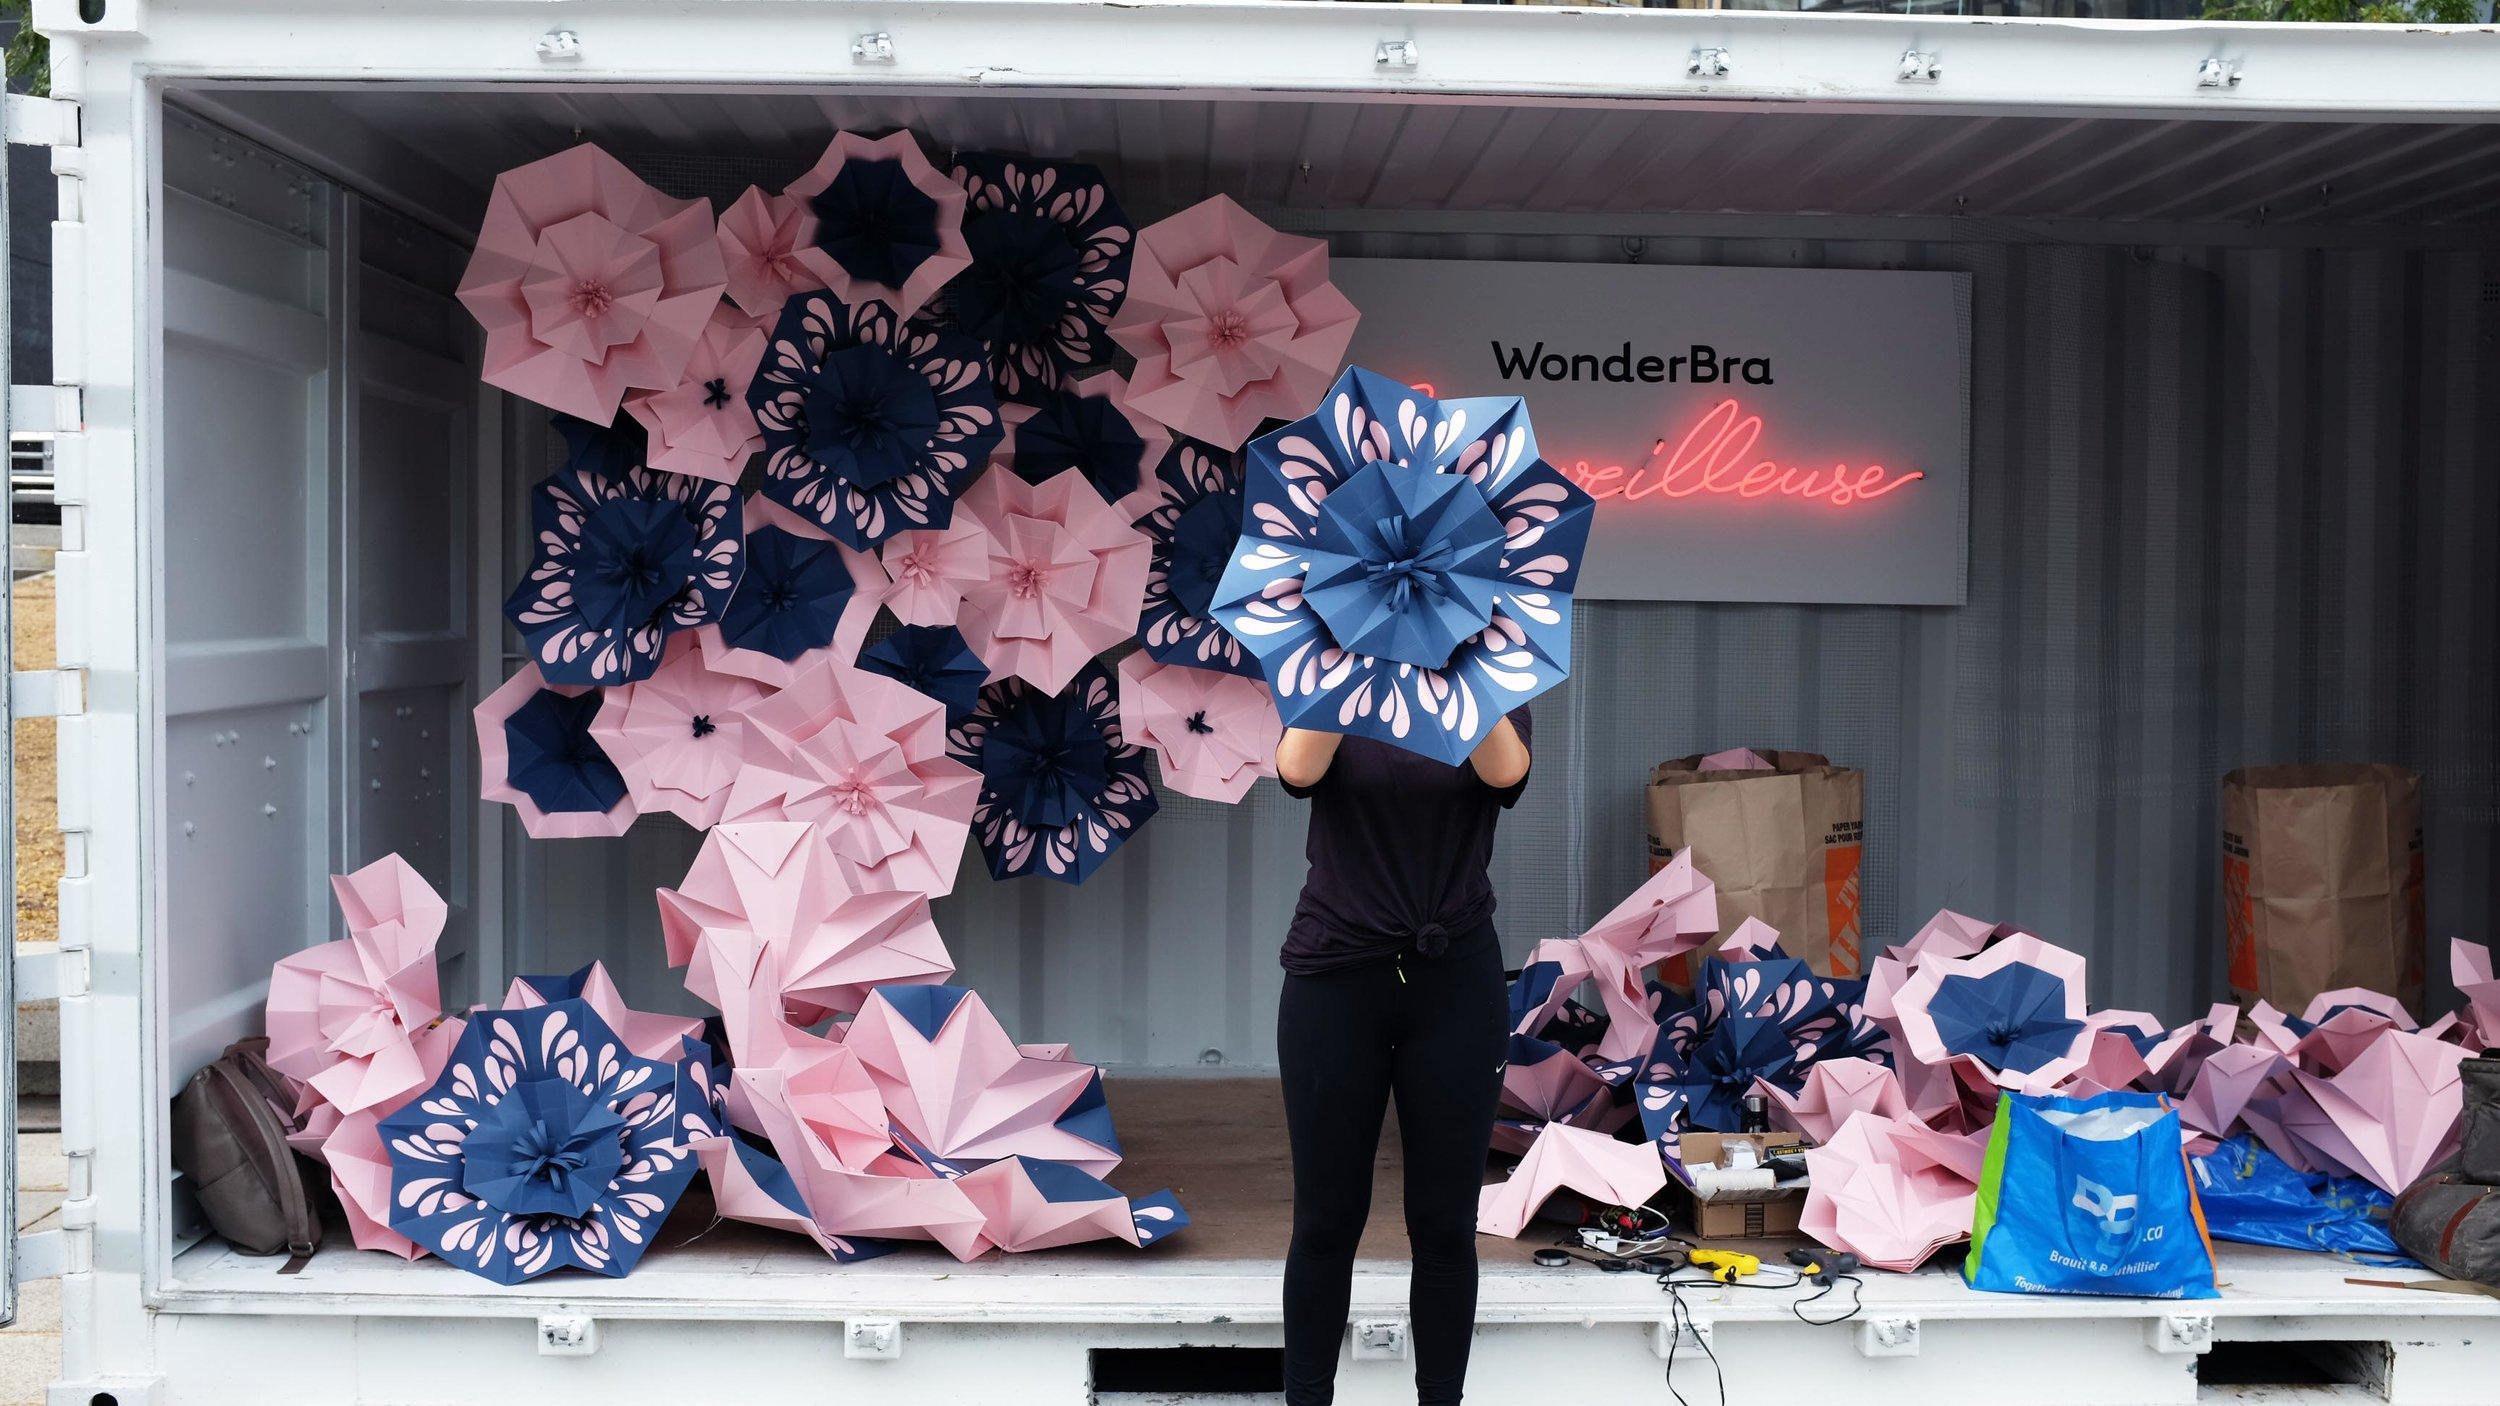 miss-cloudy-pauline-loctin-wonderbra-paper-flower-art-origami-fold-installation-6.jpeg